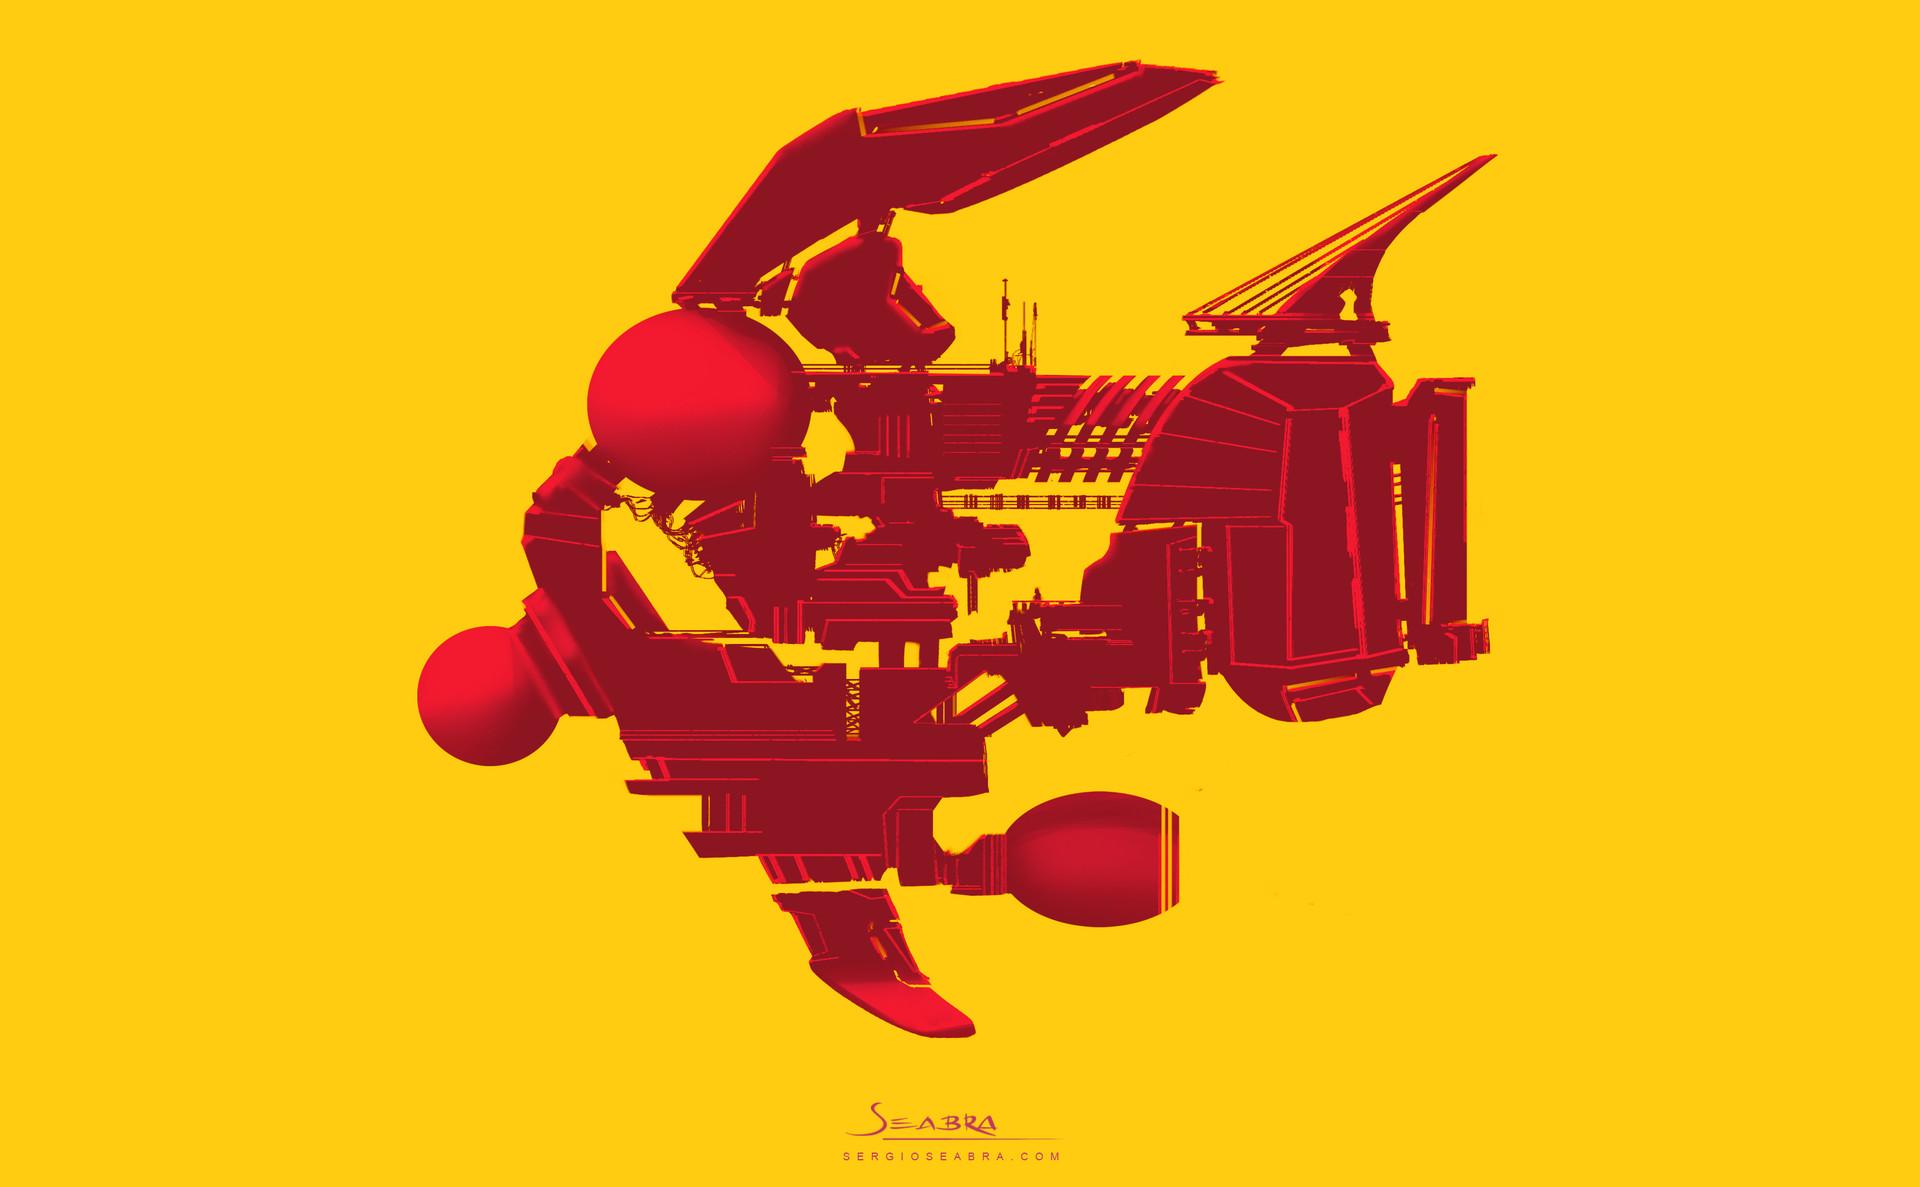 Sergio seabra 2016 spaceship expl ss3